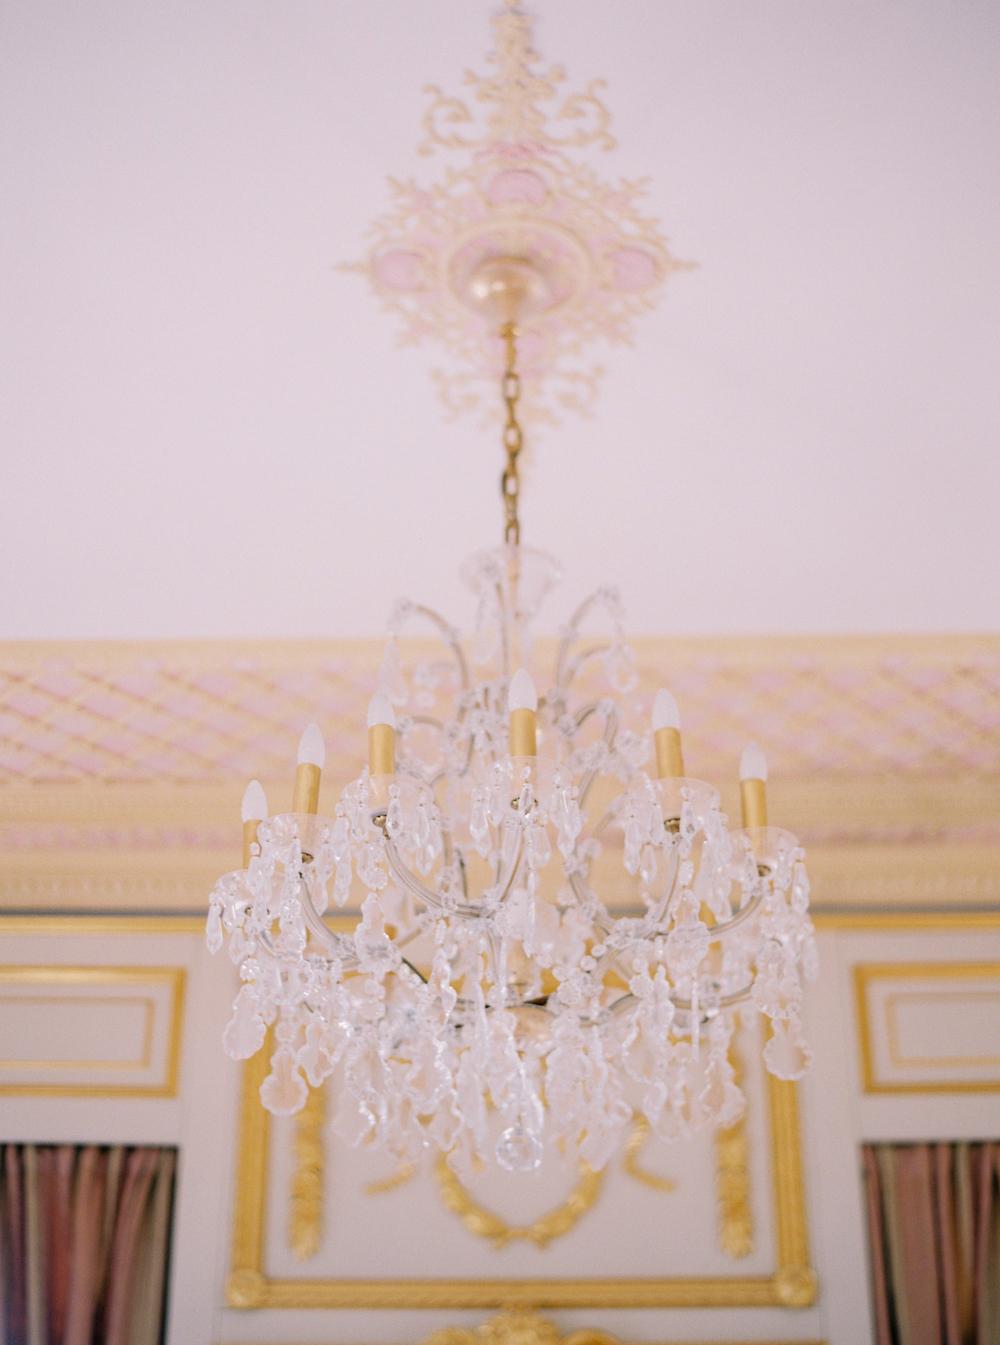 South of France château wedding venue